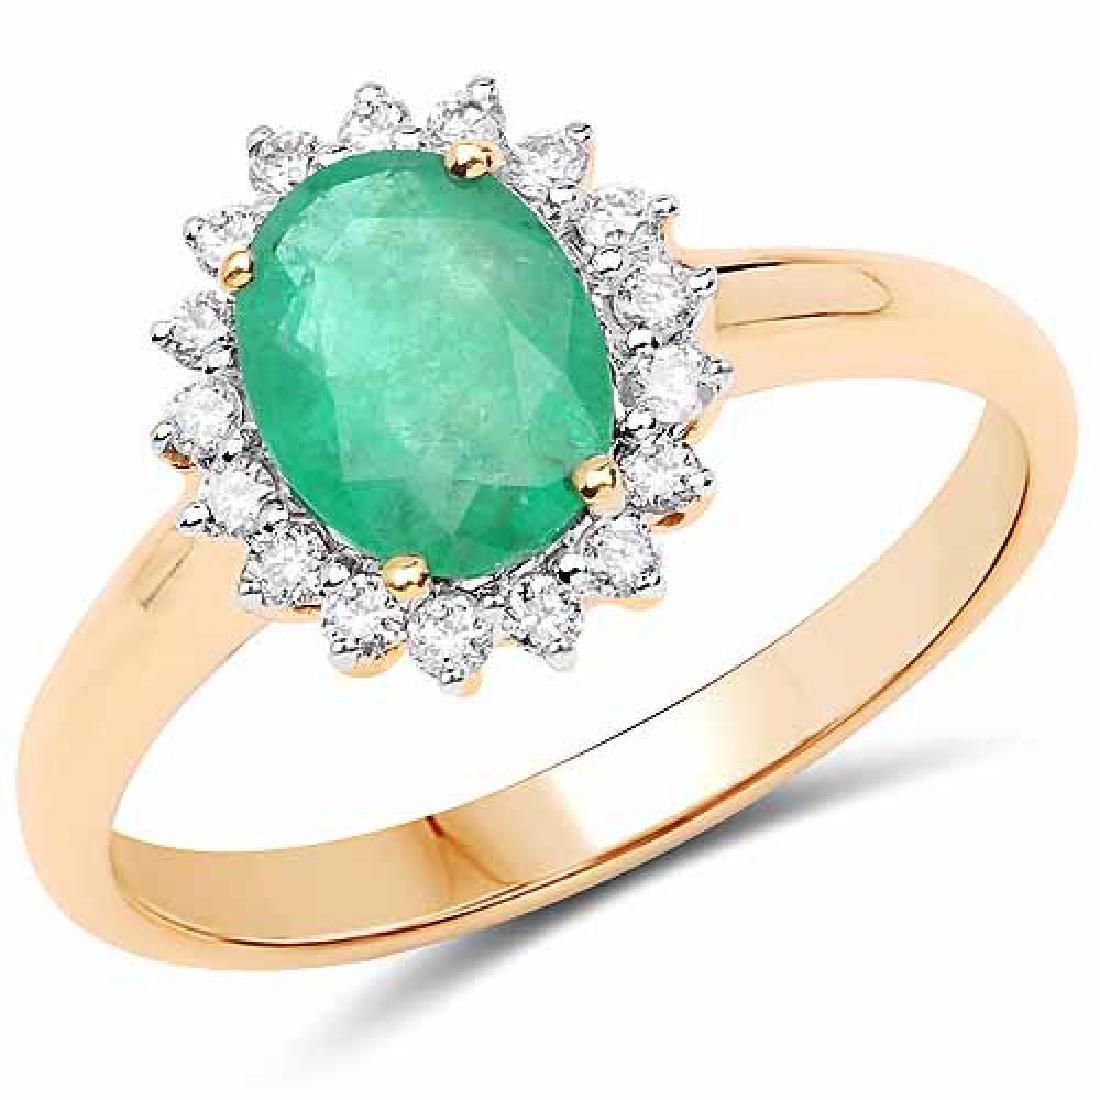 1.43 Carat Genuine Zambian Emerald and White Diamond 14